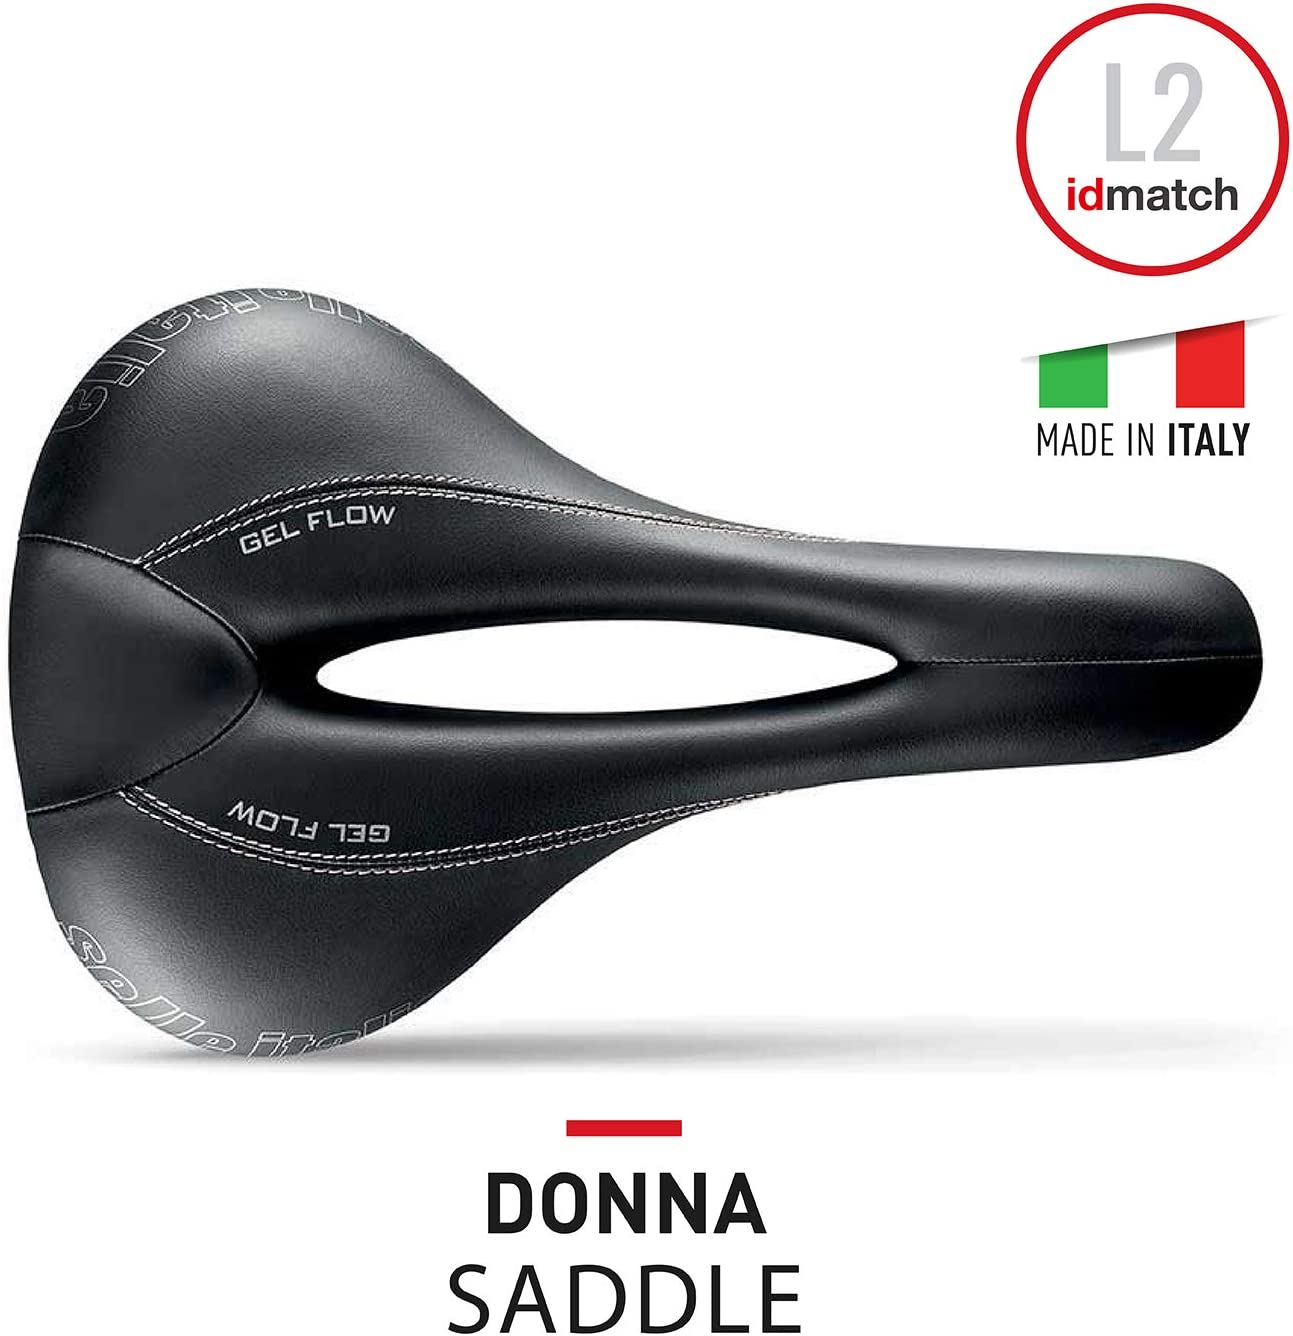 Comfort Gel Sill/ìn Road Gran Turismo Duro-tek Sill/ìn Bicicleta de Carretera Donna Amortiguador Rail FeC Alloy /Ø7 Selle Italia